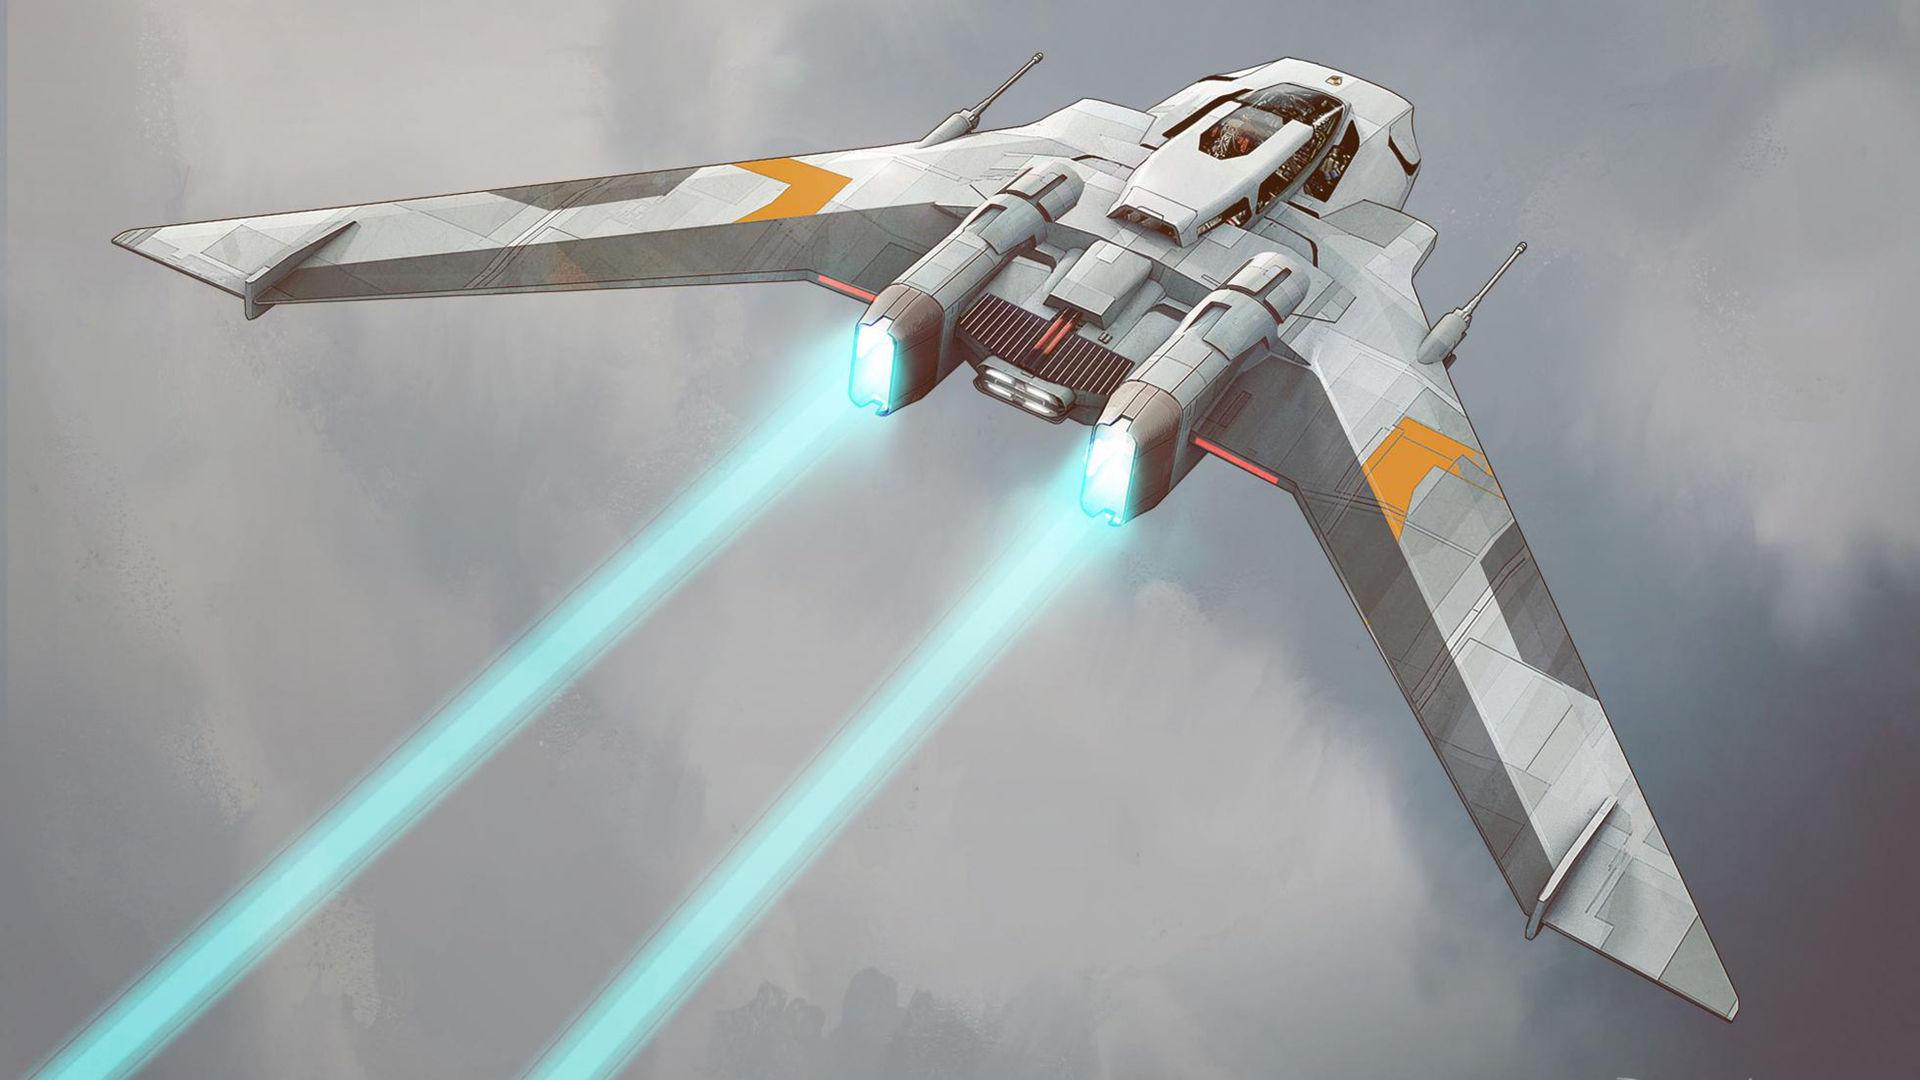 Nya bilder på Porsches Star Wars-skepp